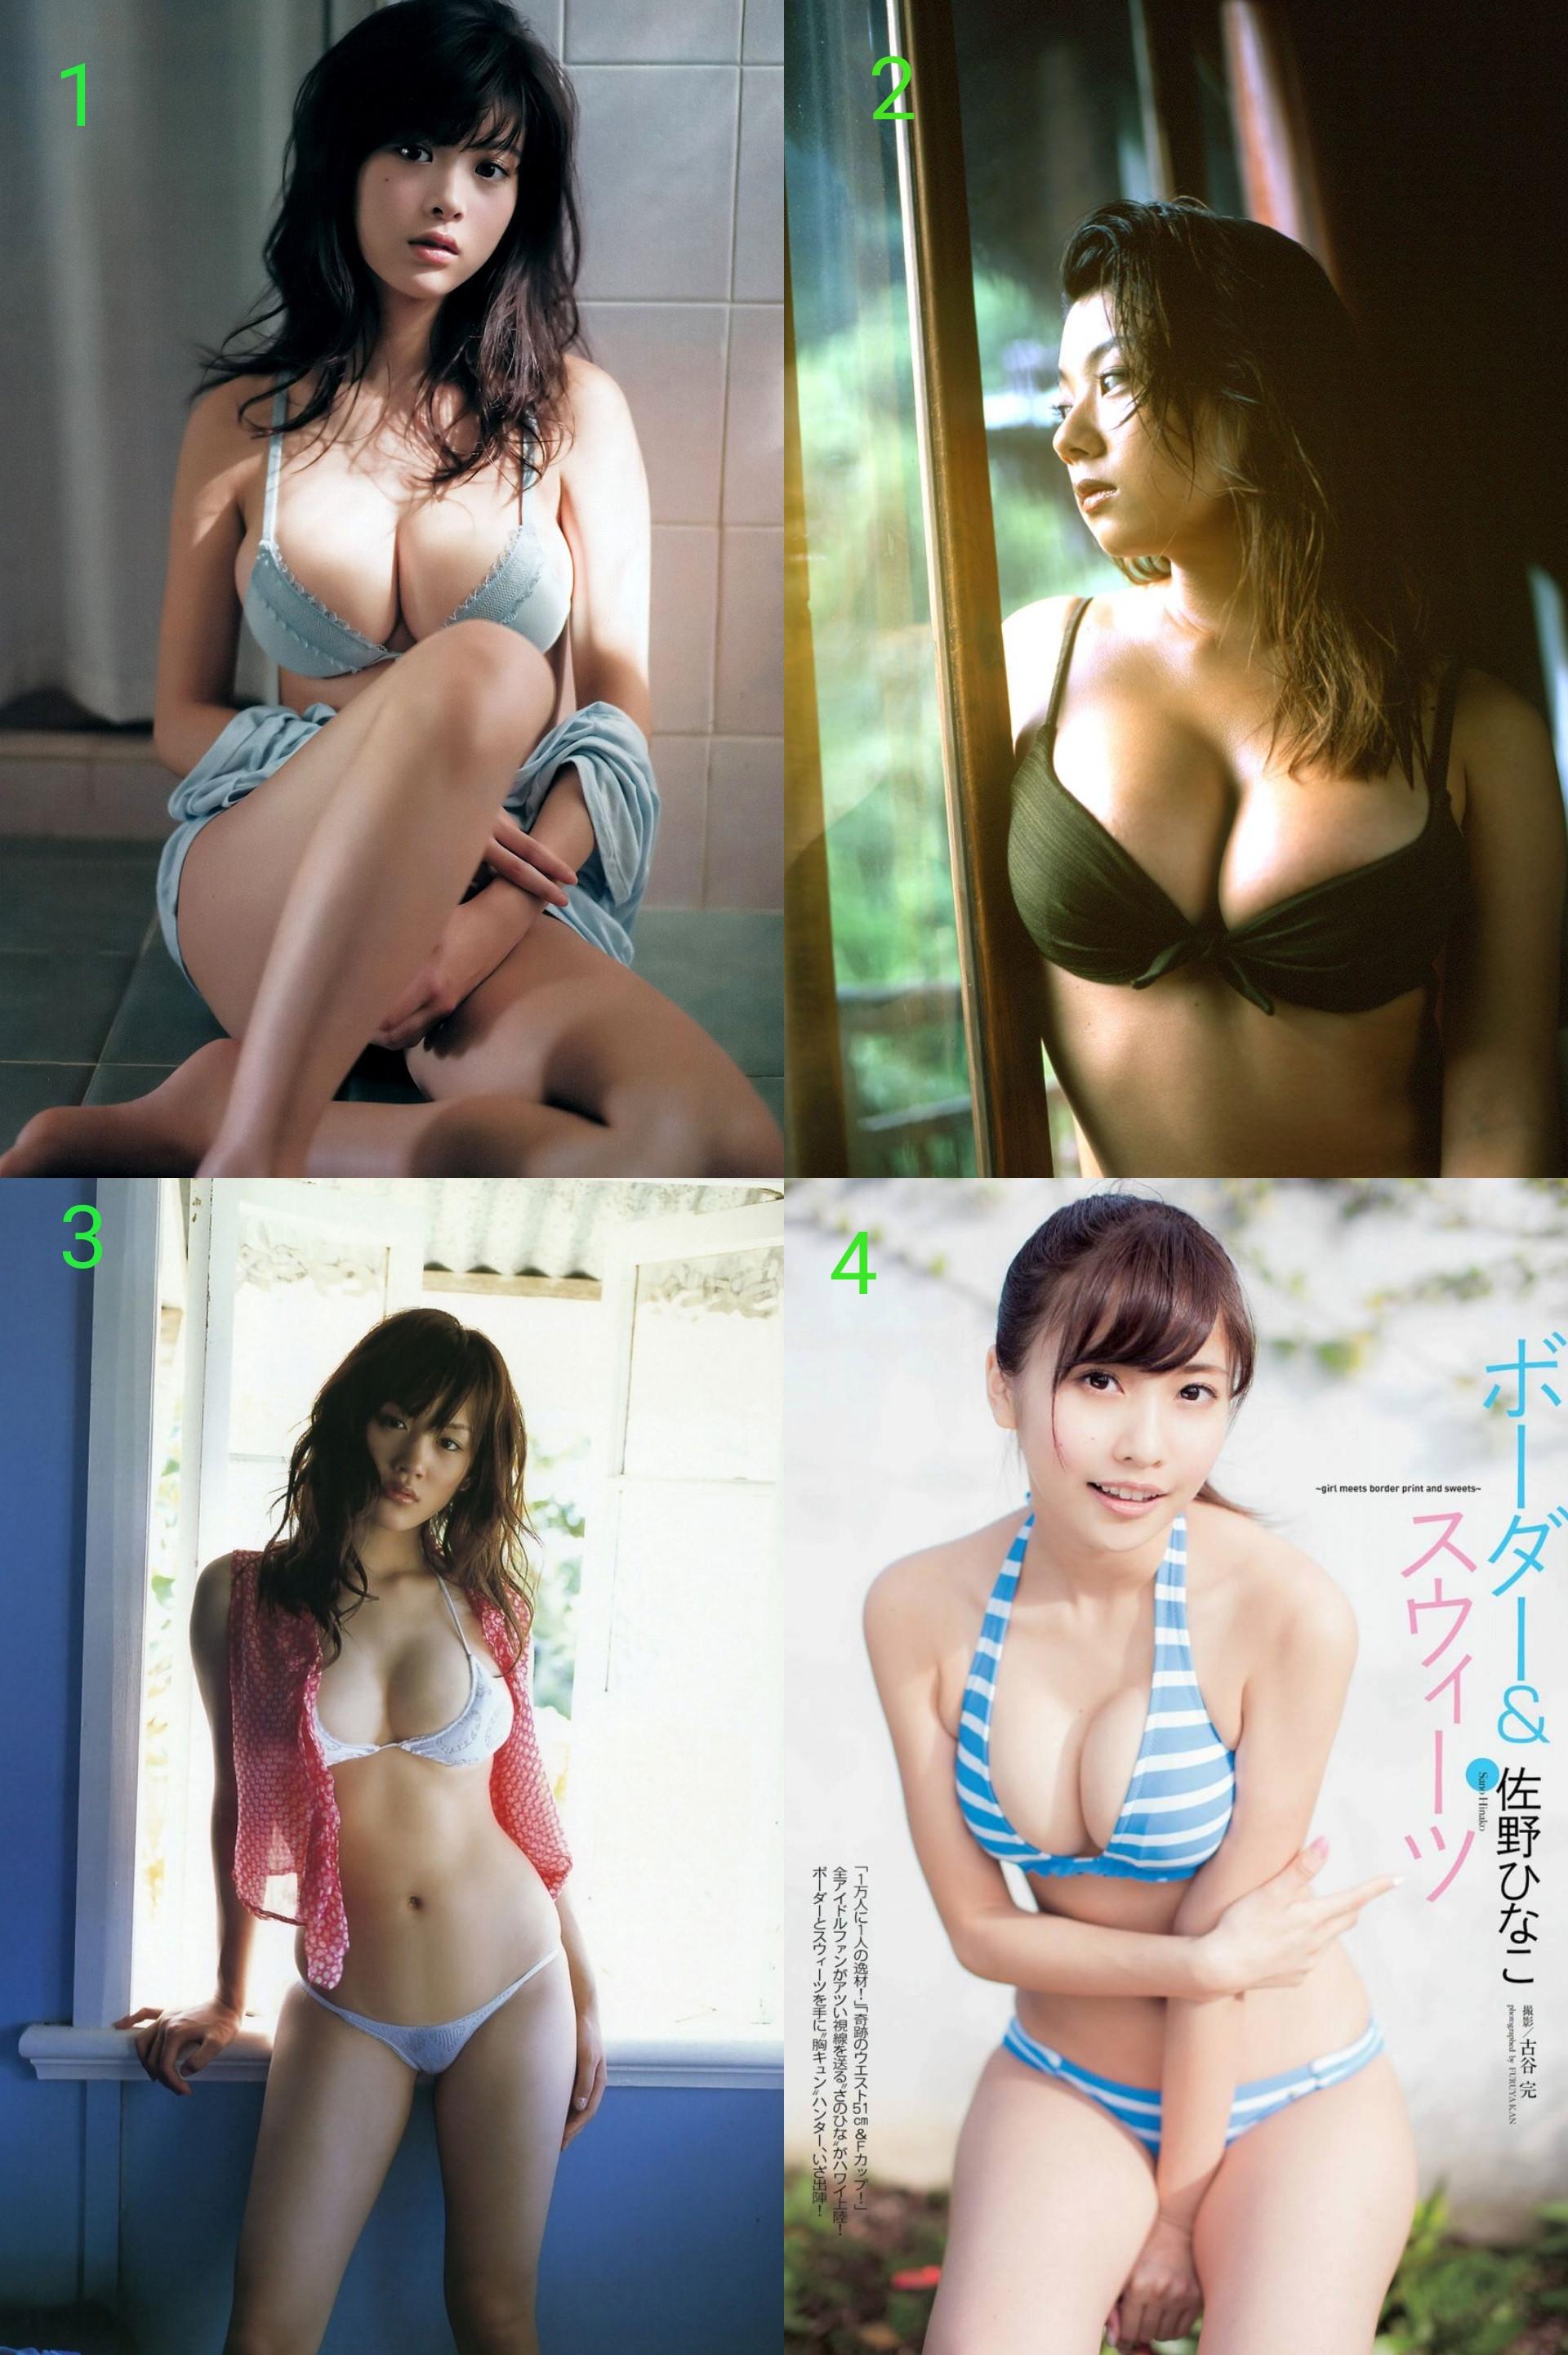 Japanese Actresses In Bikinis: Fumika Baba, Eiko Koike, Ayase Haruka, Hinako Sano